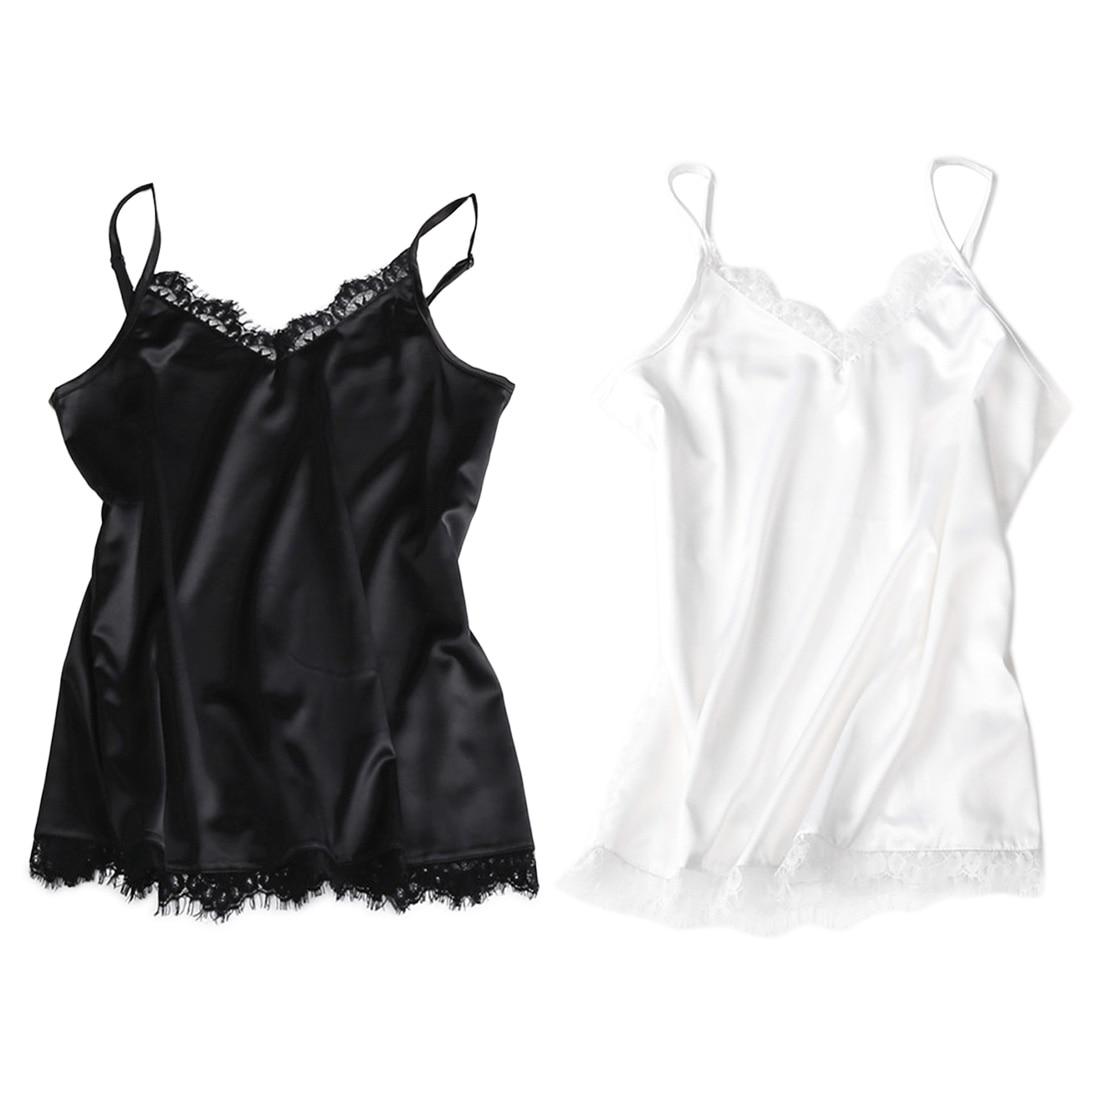 Satin Eyelash Lace Trim Strappy V Neck Cami Party Shiny Top Vest Blouse Camisole